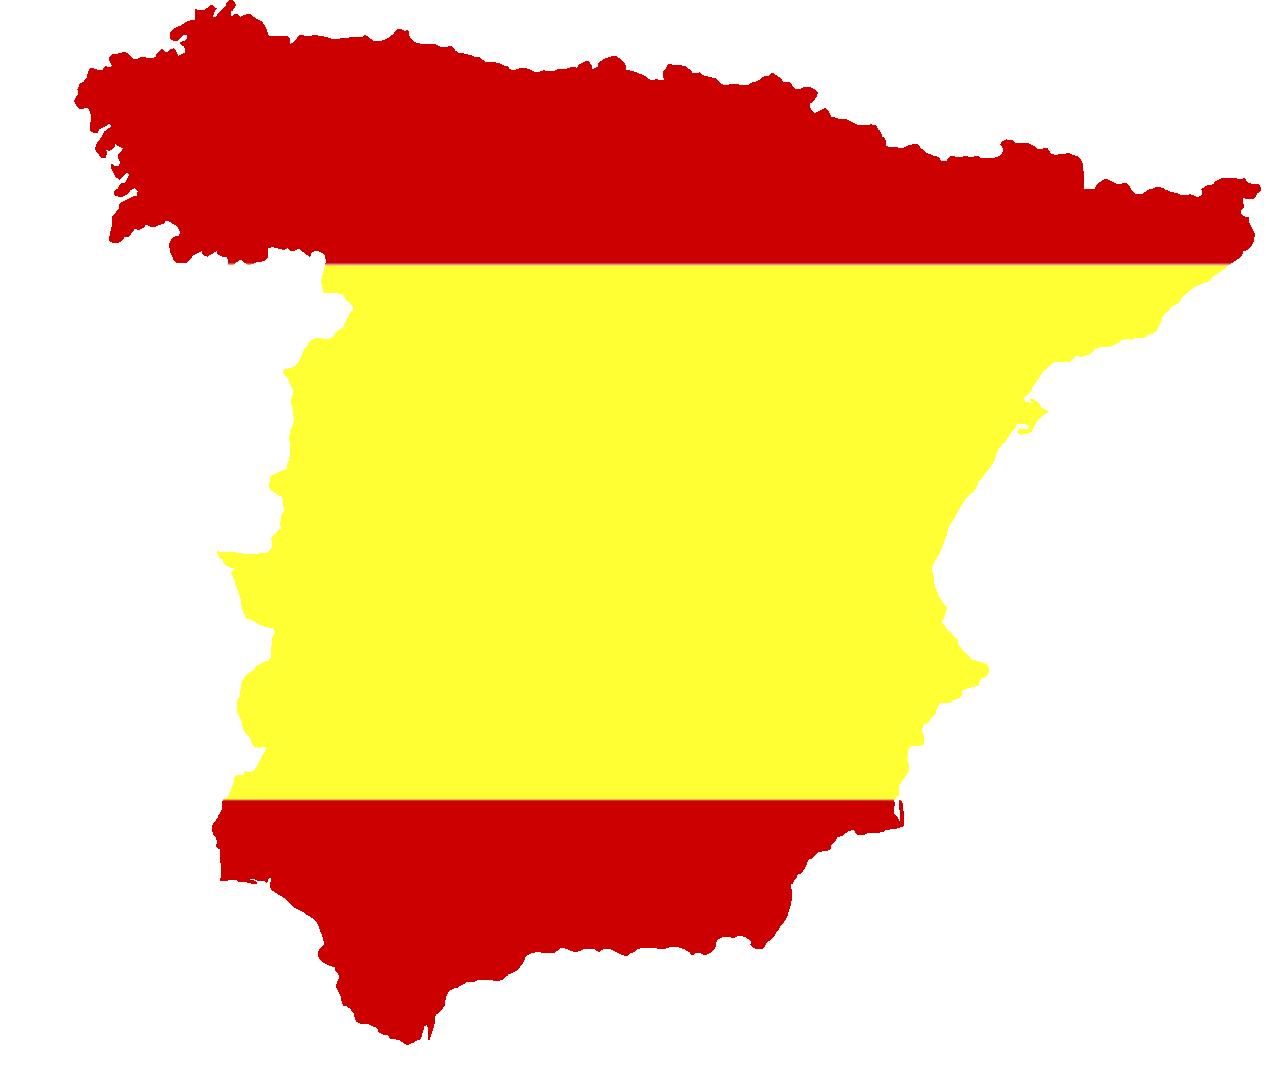 Silueta Mapa De España Png.File Silhouette Spain With Flag Png Wikimedia Commons